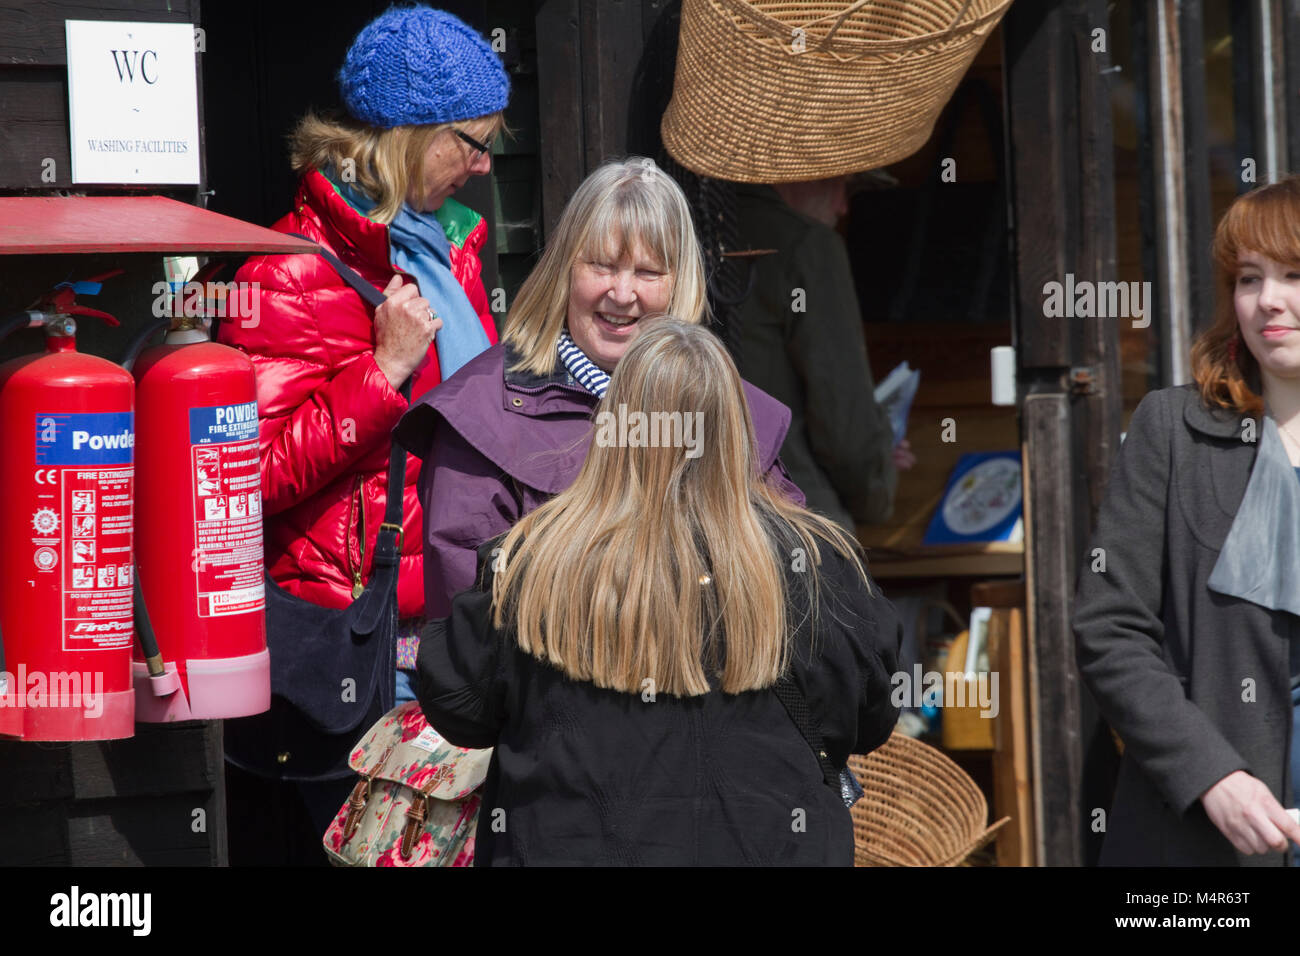 Women at a craft fair - Stock Image